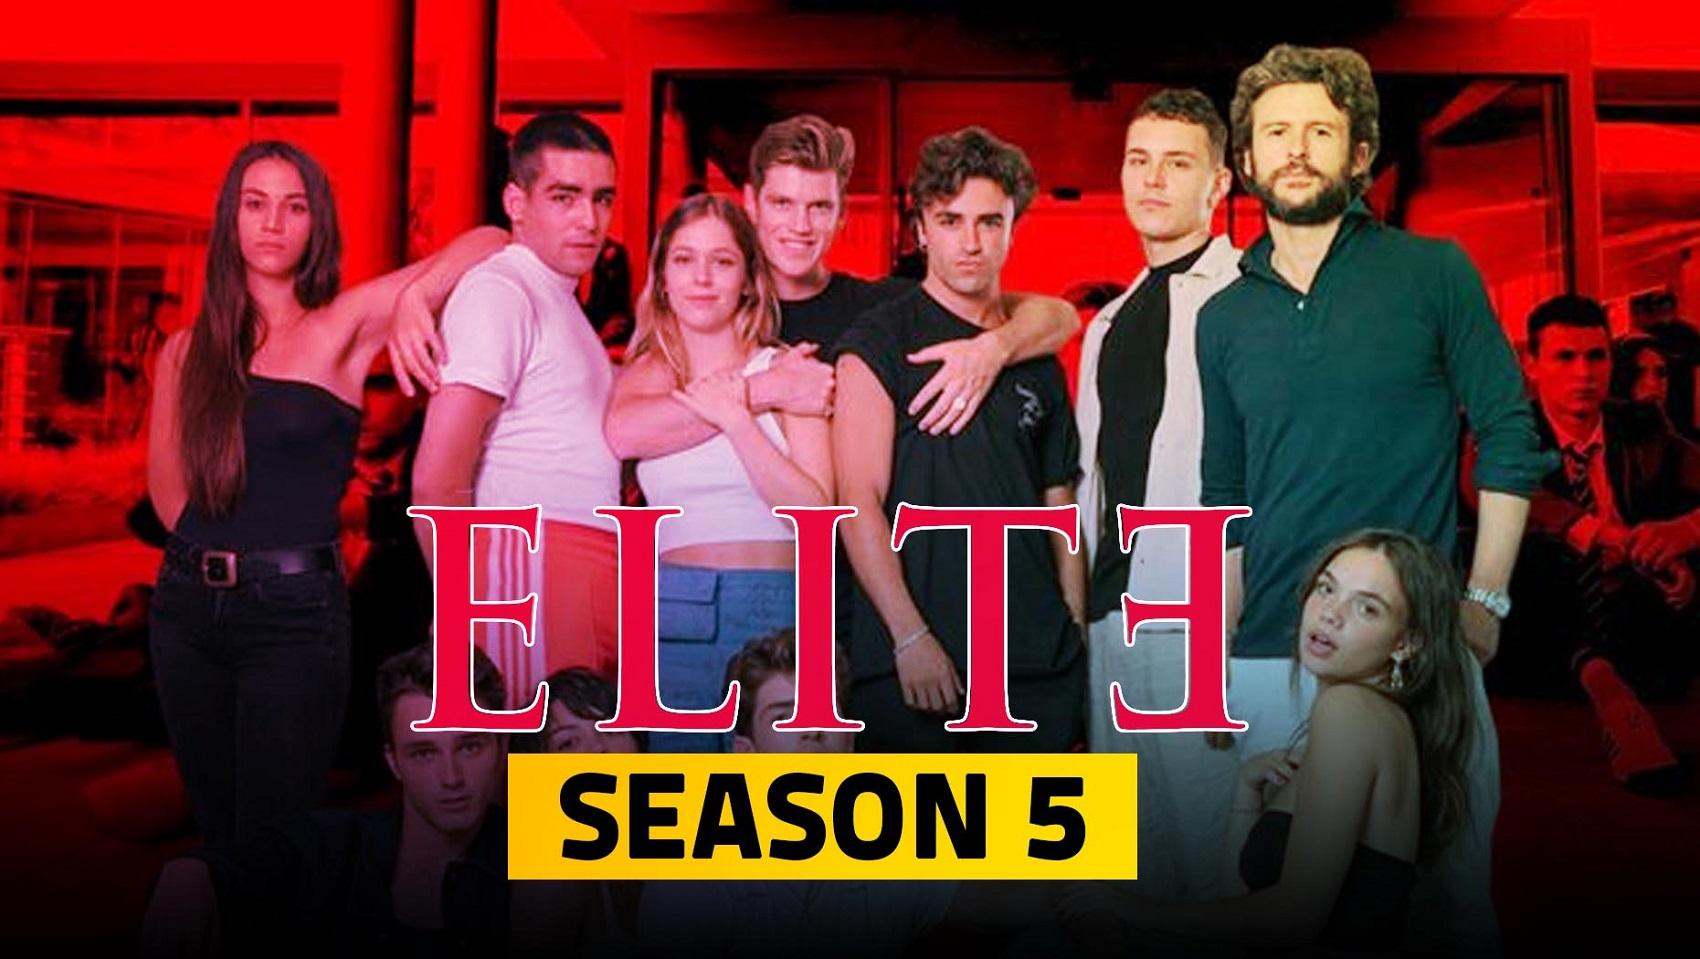 Elite Season 5: These Actors Are Not Returning! - WTTSPOD